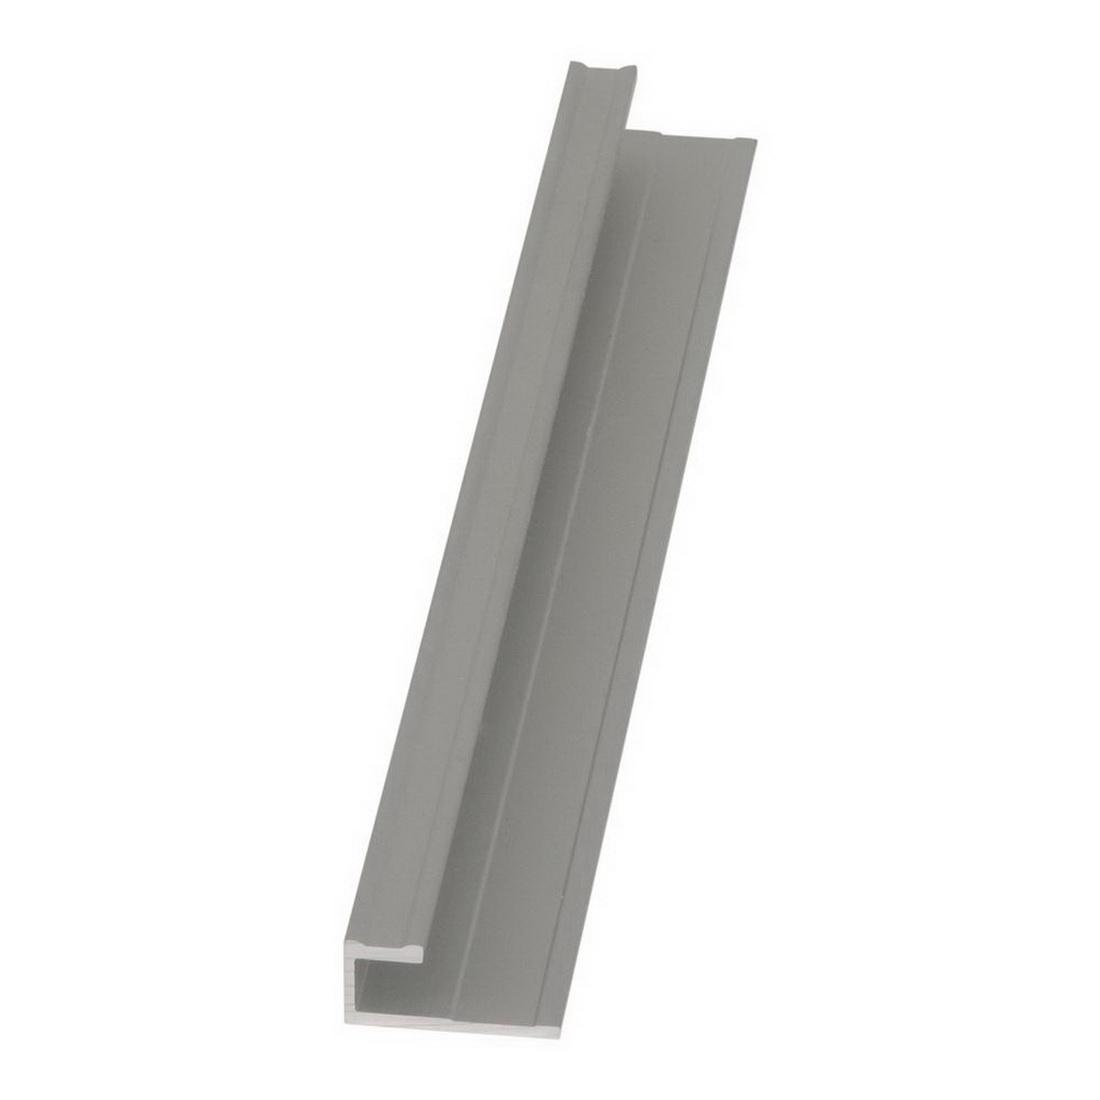 HardieGlaze 4.5mm Cap Aluminium 2700mm Naturally Anodised